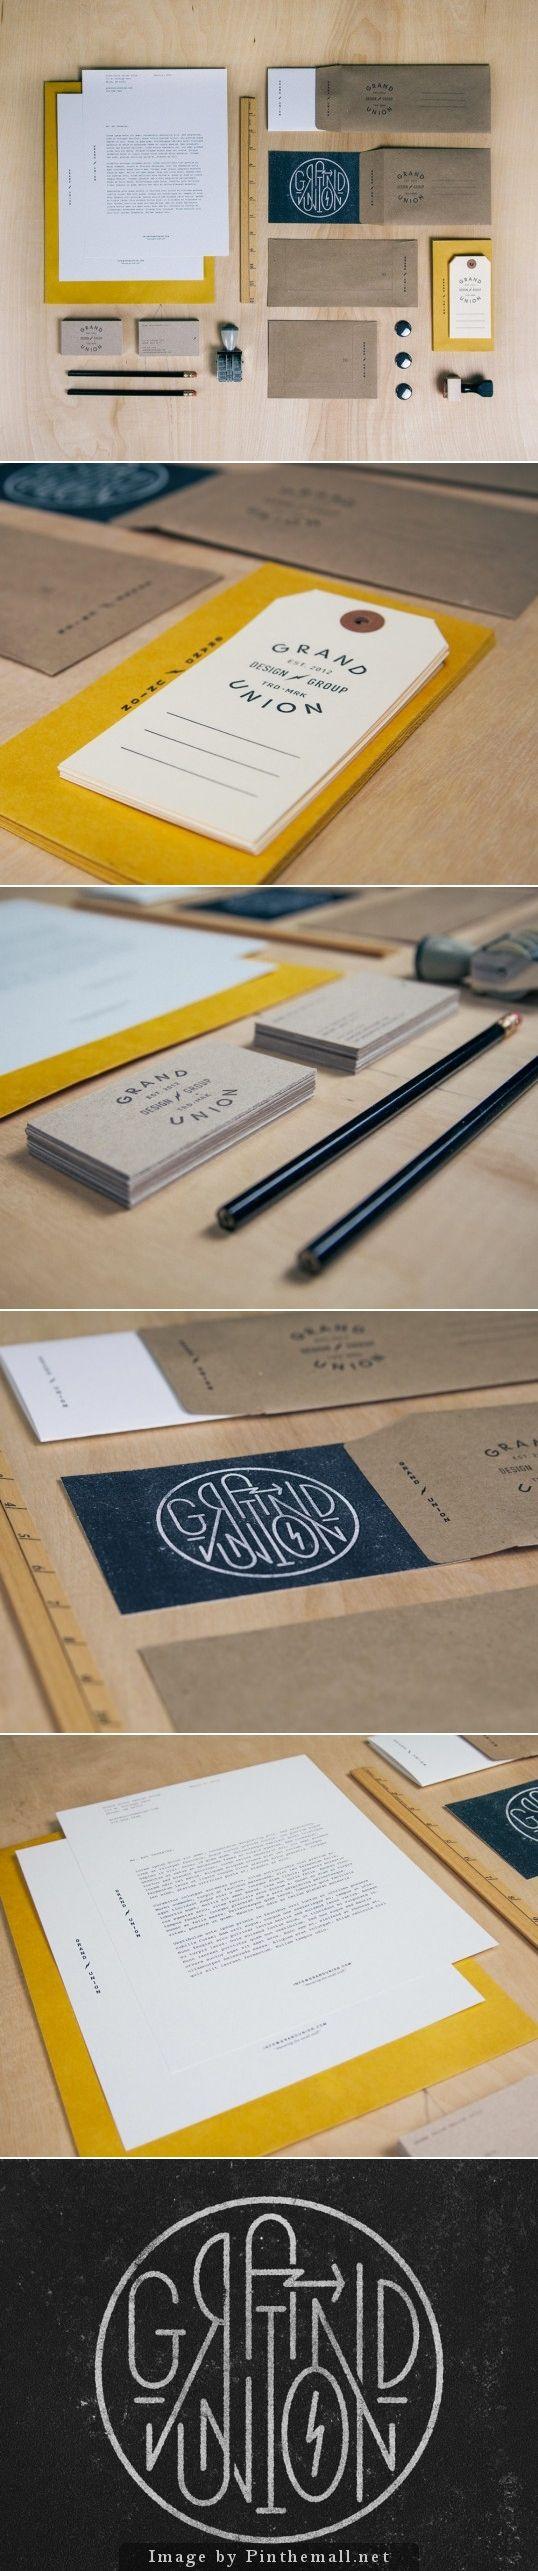 color palette Corporate identity branding stationary minimal graphic logo design print business card letterhead craft paper cardboard vintage